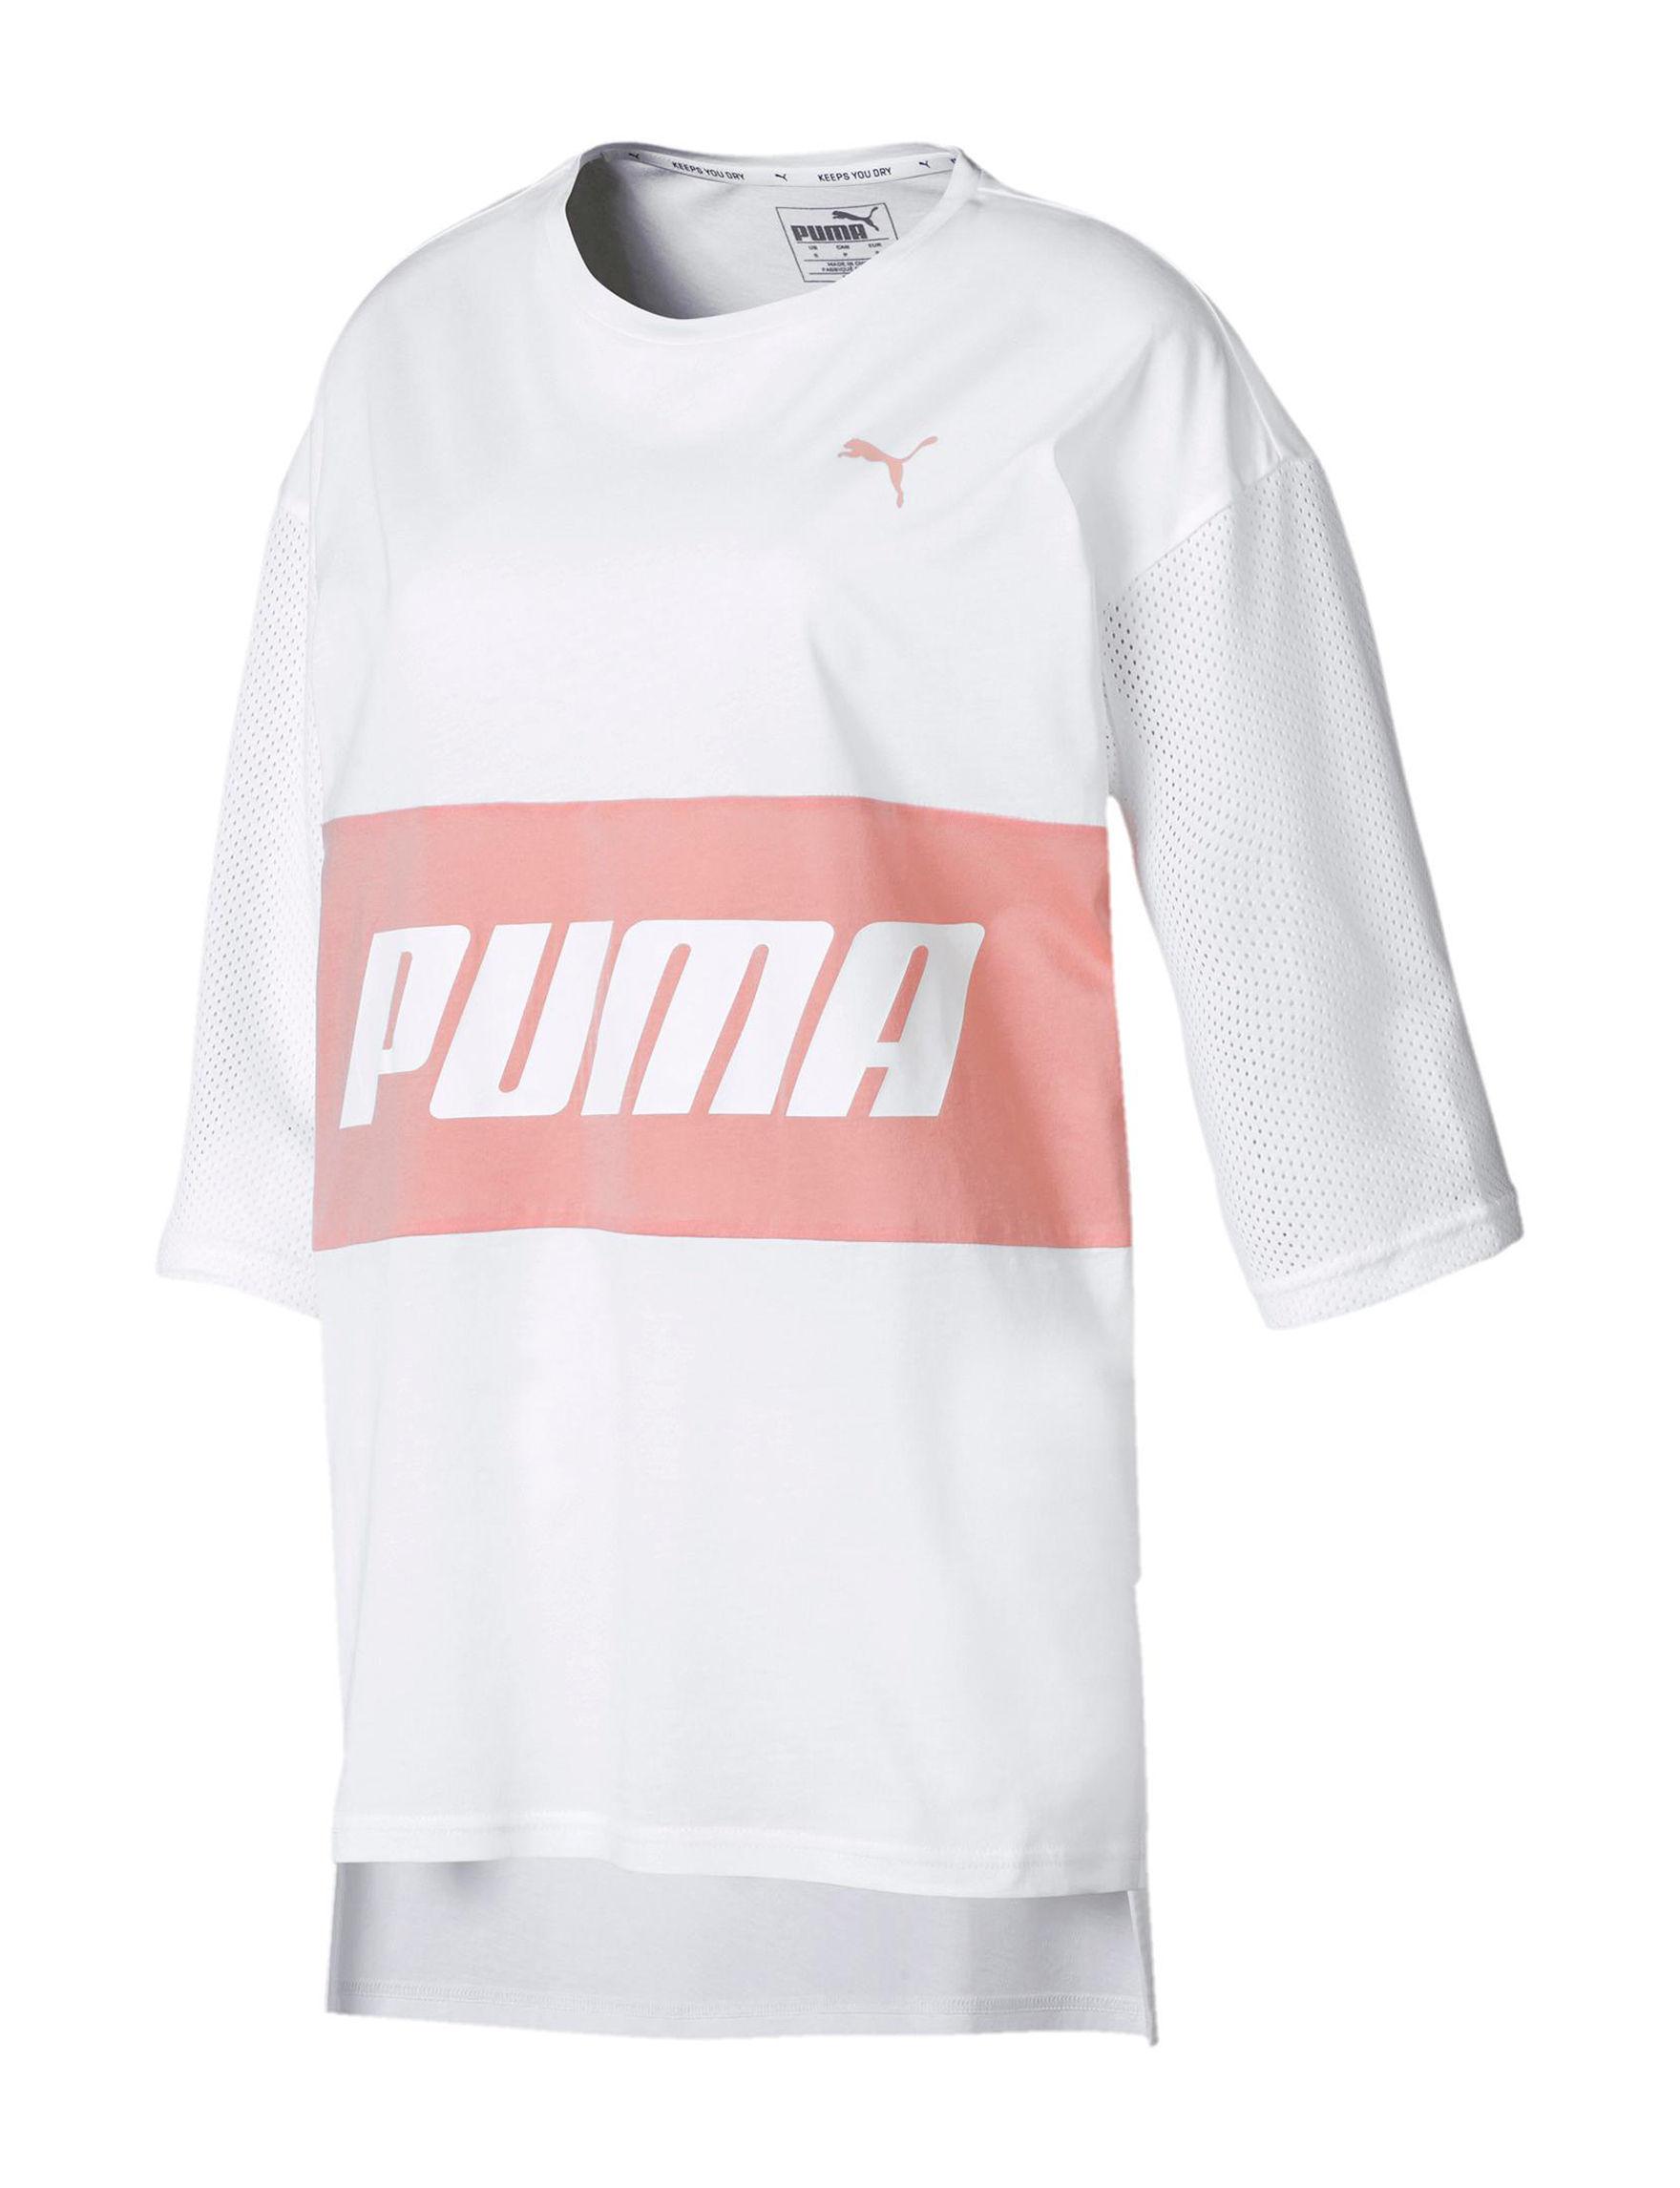 Puma White / Pink Tees & Tanks